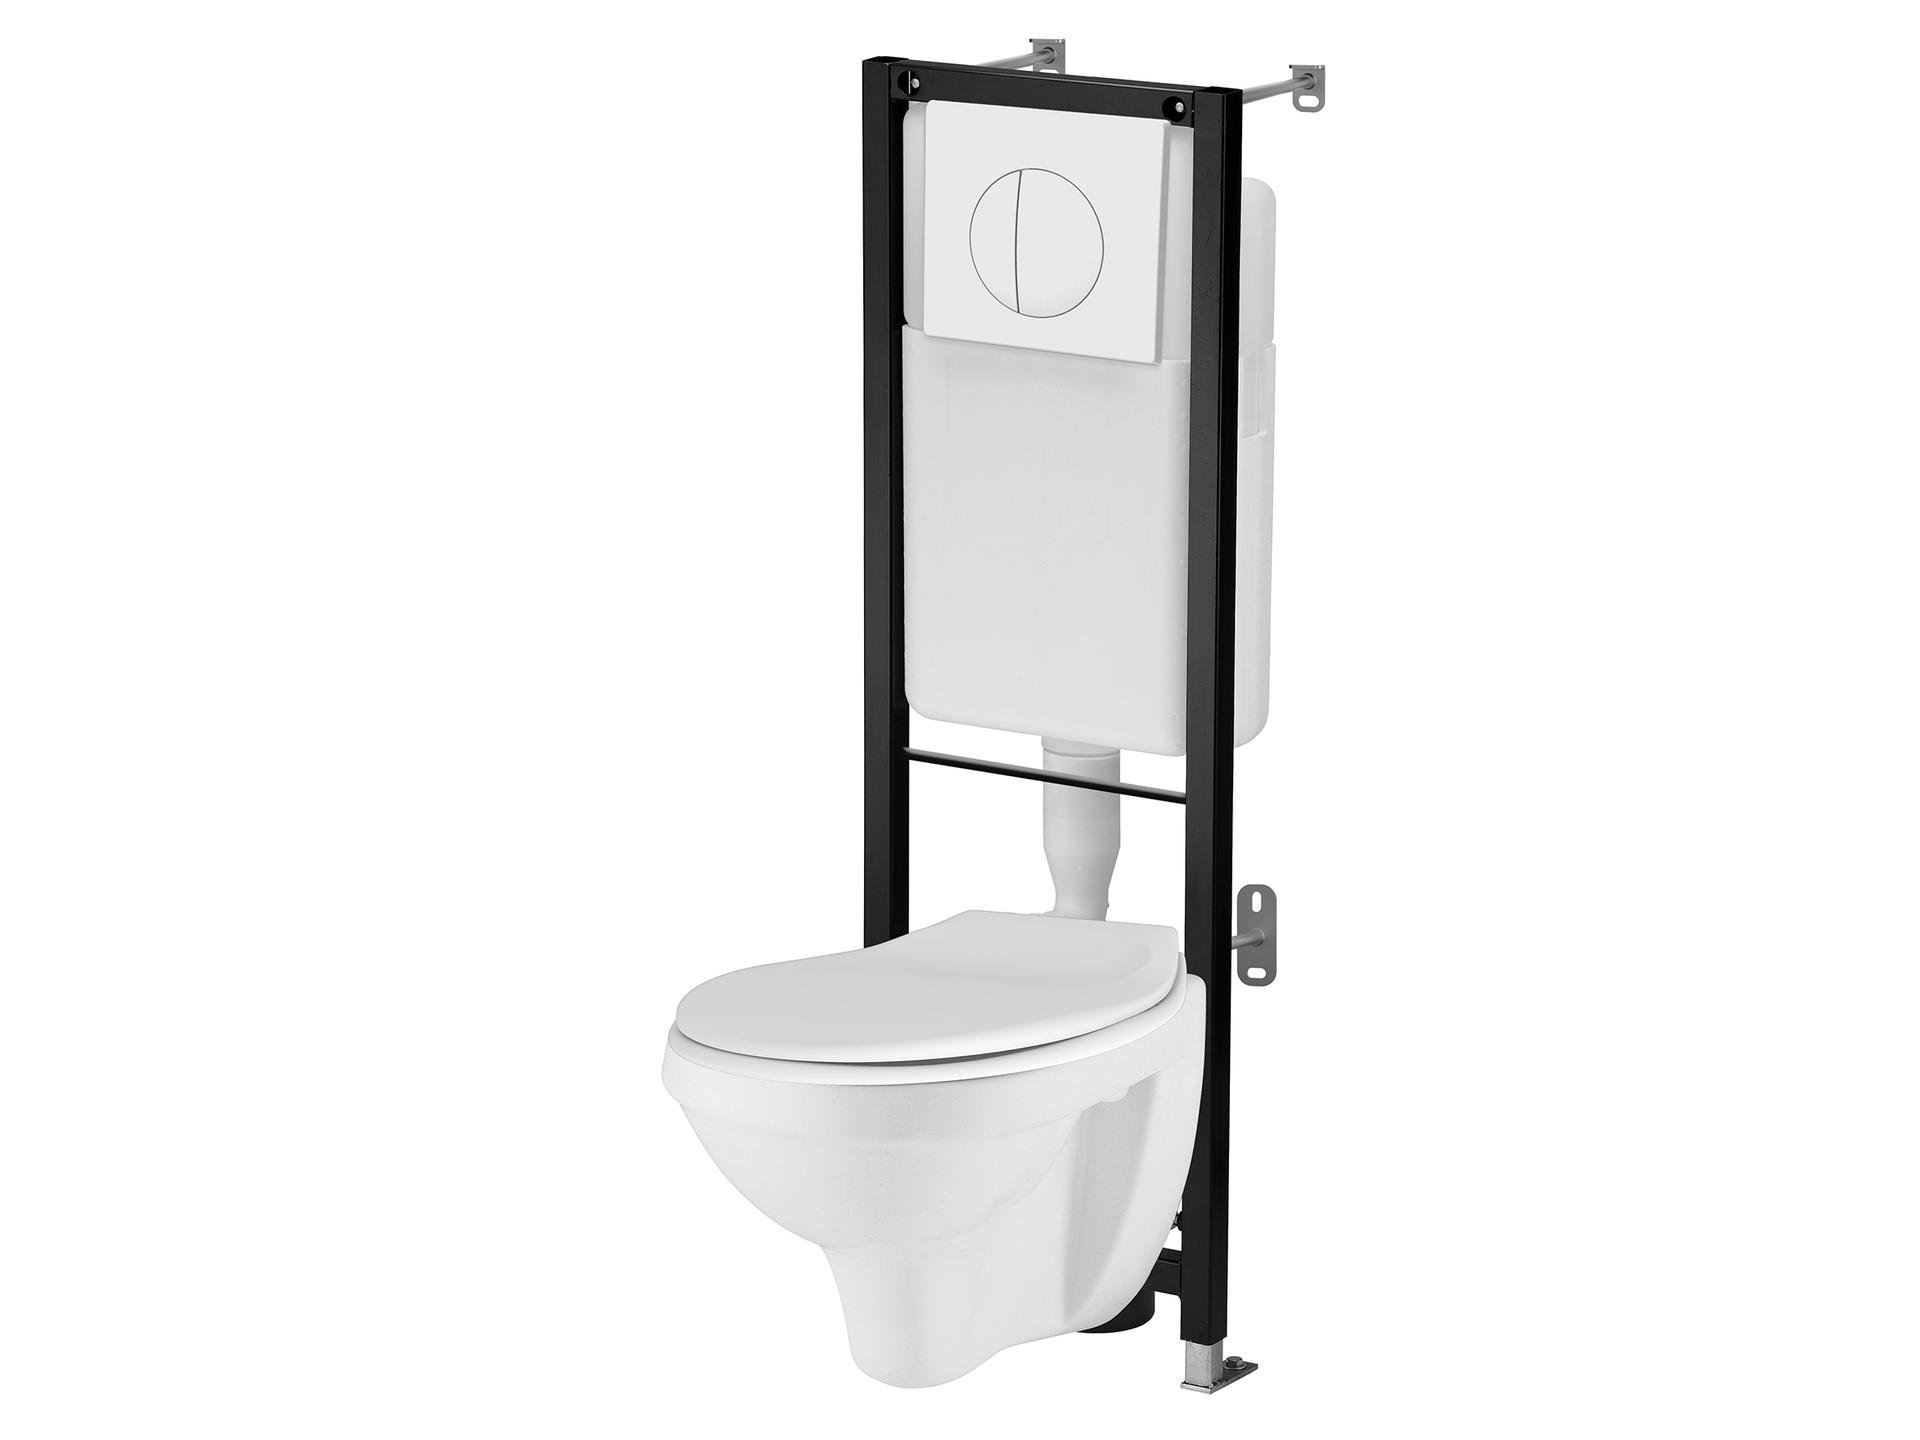 Wc Suspendu 4 Pieds pack de wc suspendu initia lafiness - mr.bricolage